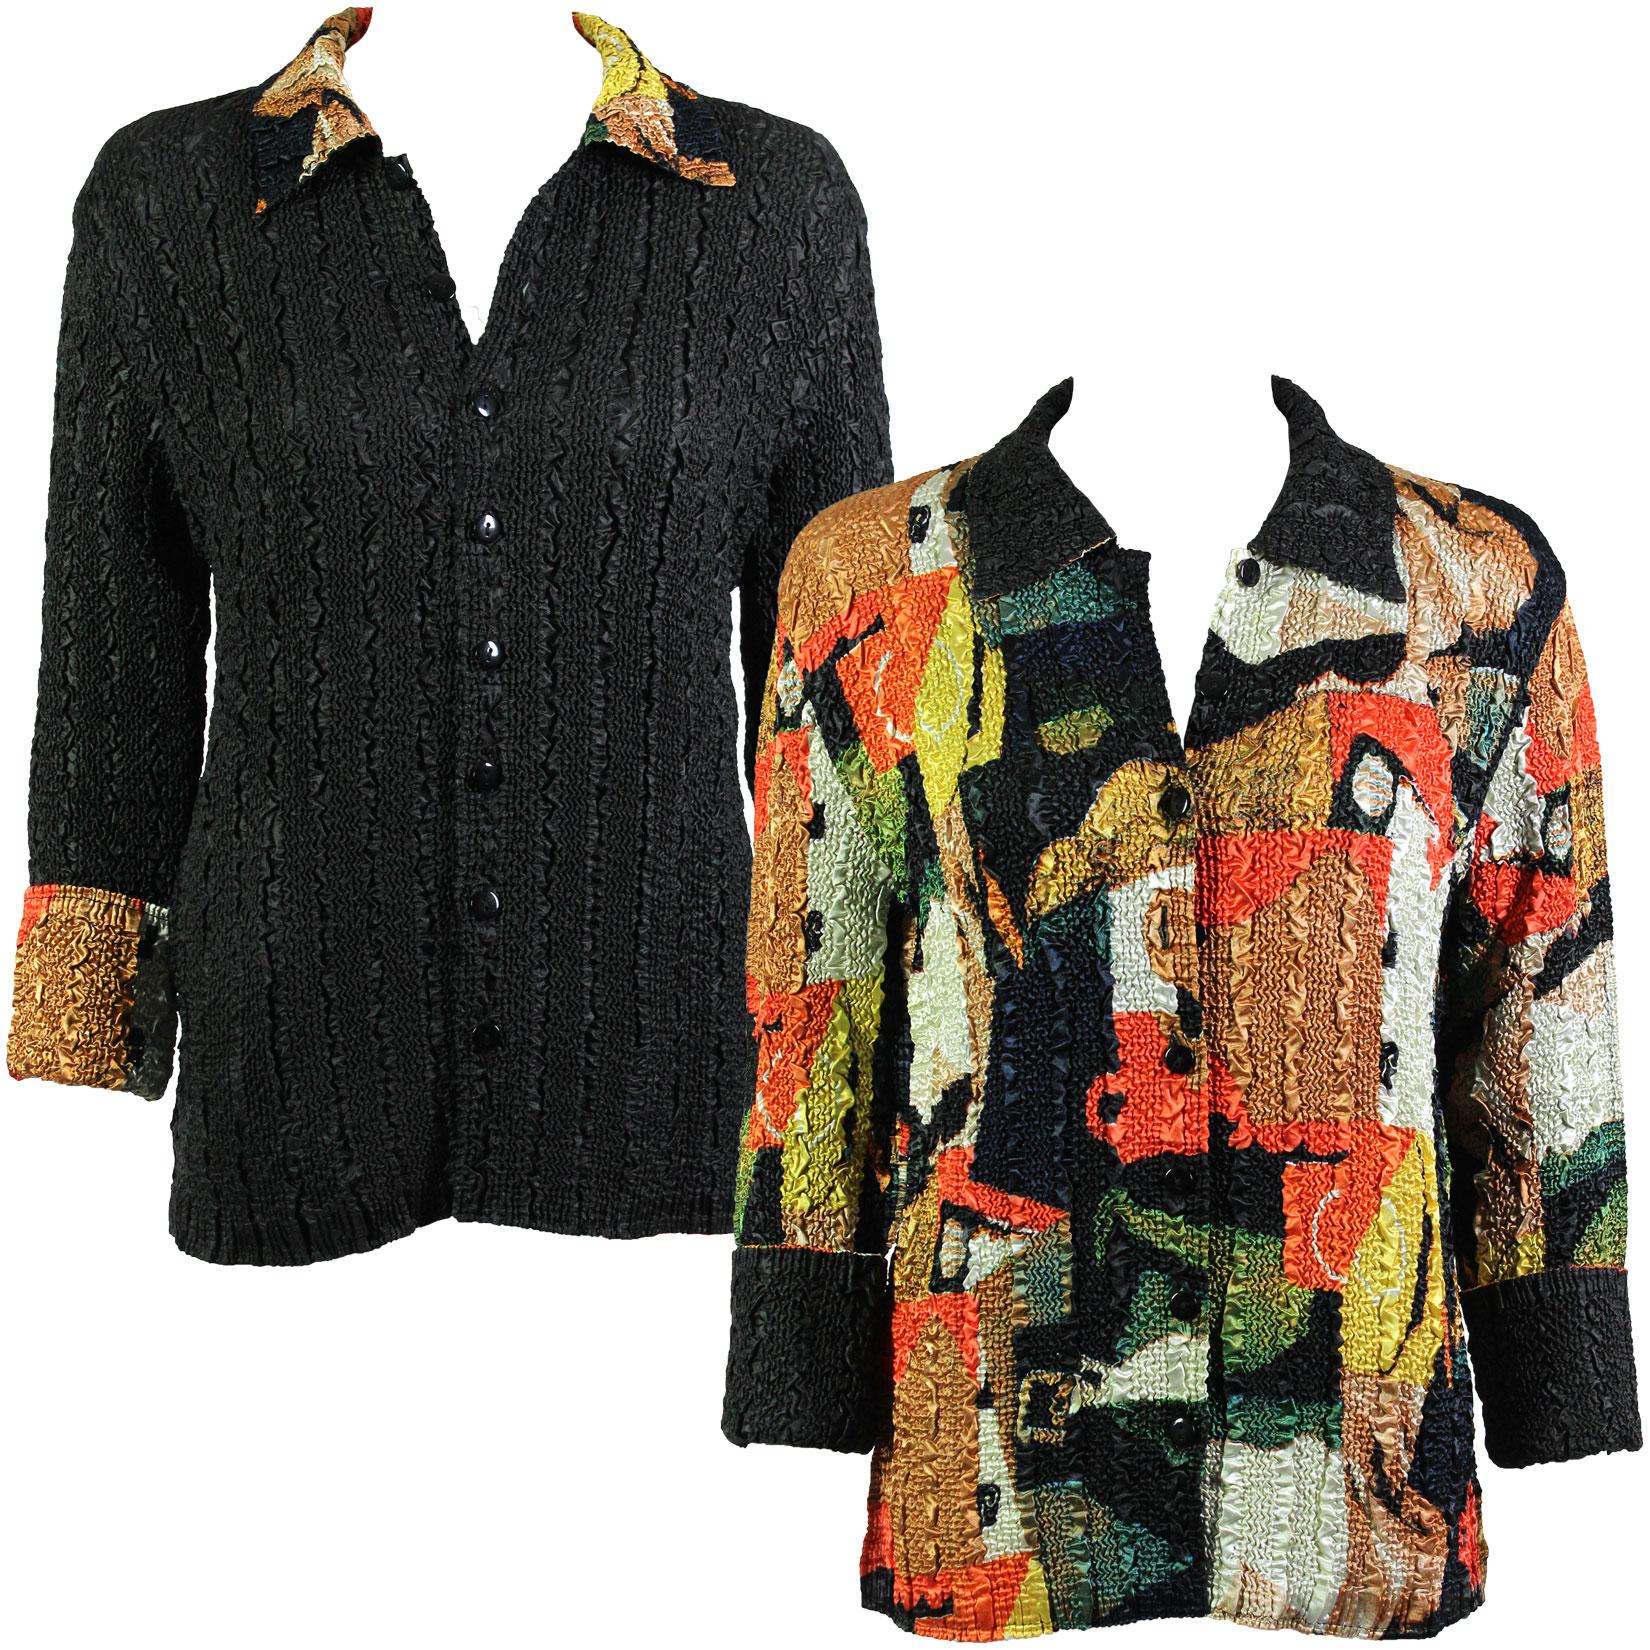 Wholesale Magic Crush - Reversible Jackets #14019 Modern Abstract Print MB - L-XL